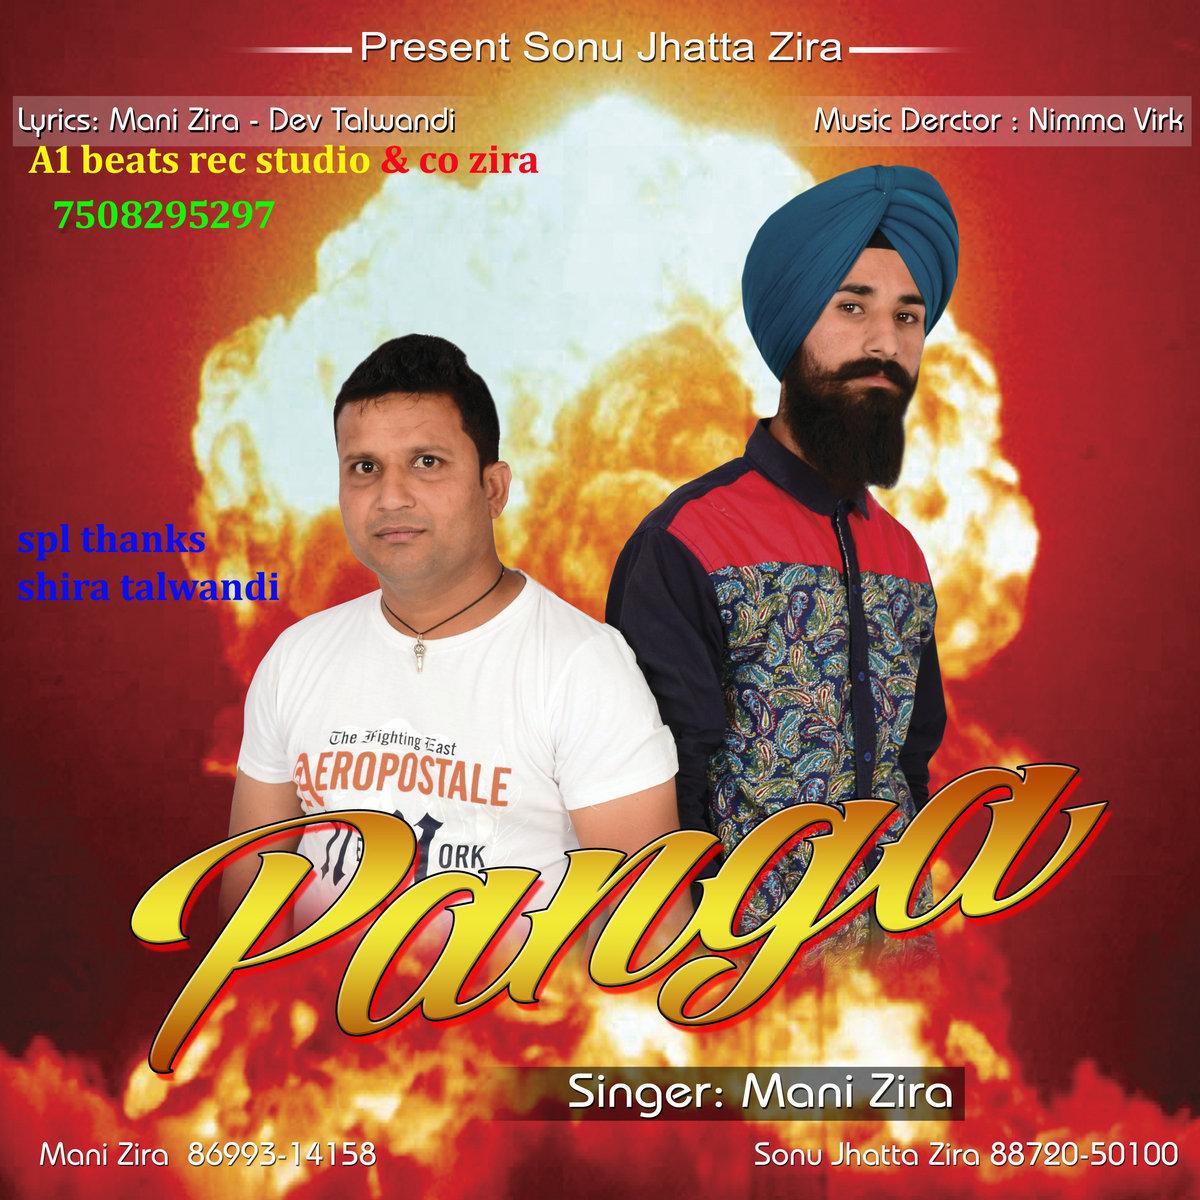 english to hindi movie bhai thakur free download | clubalnorta